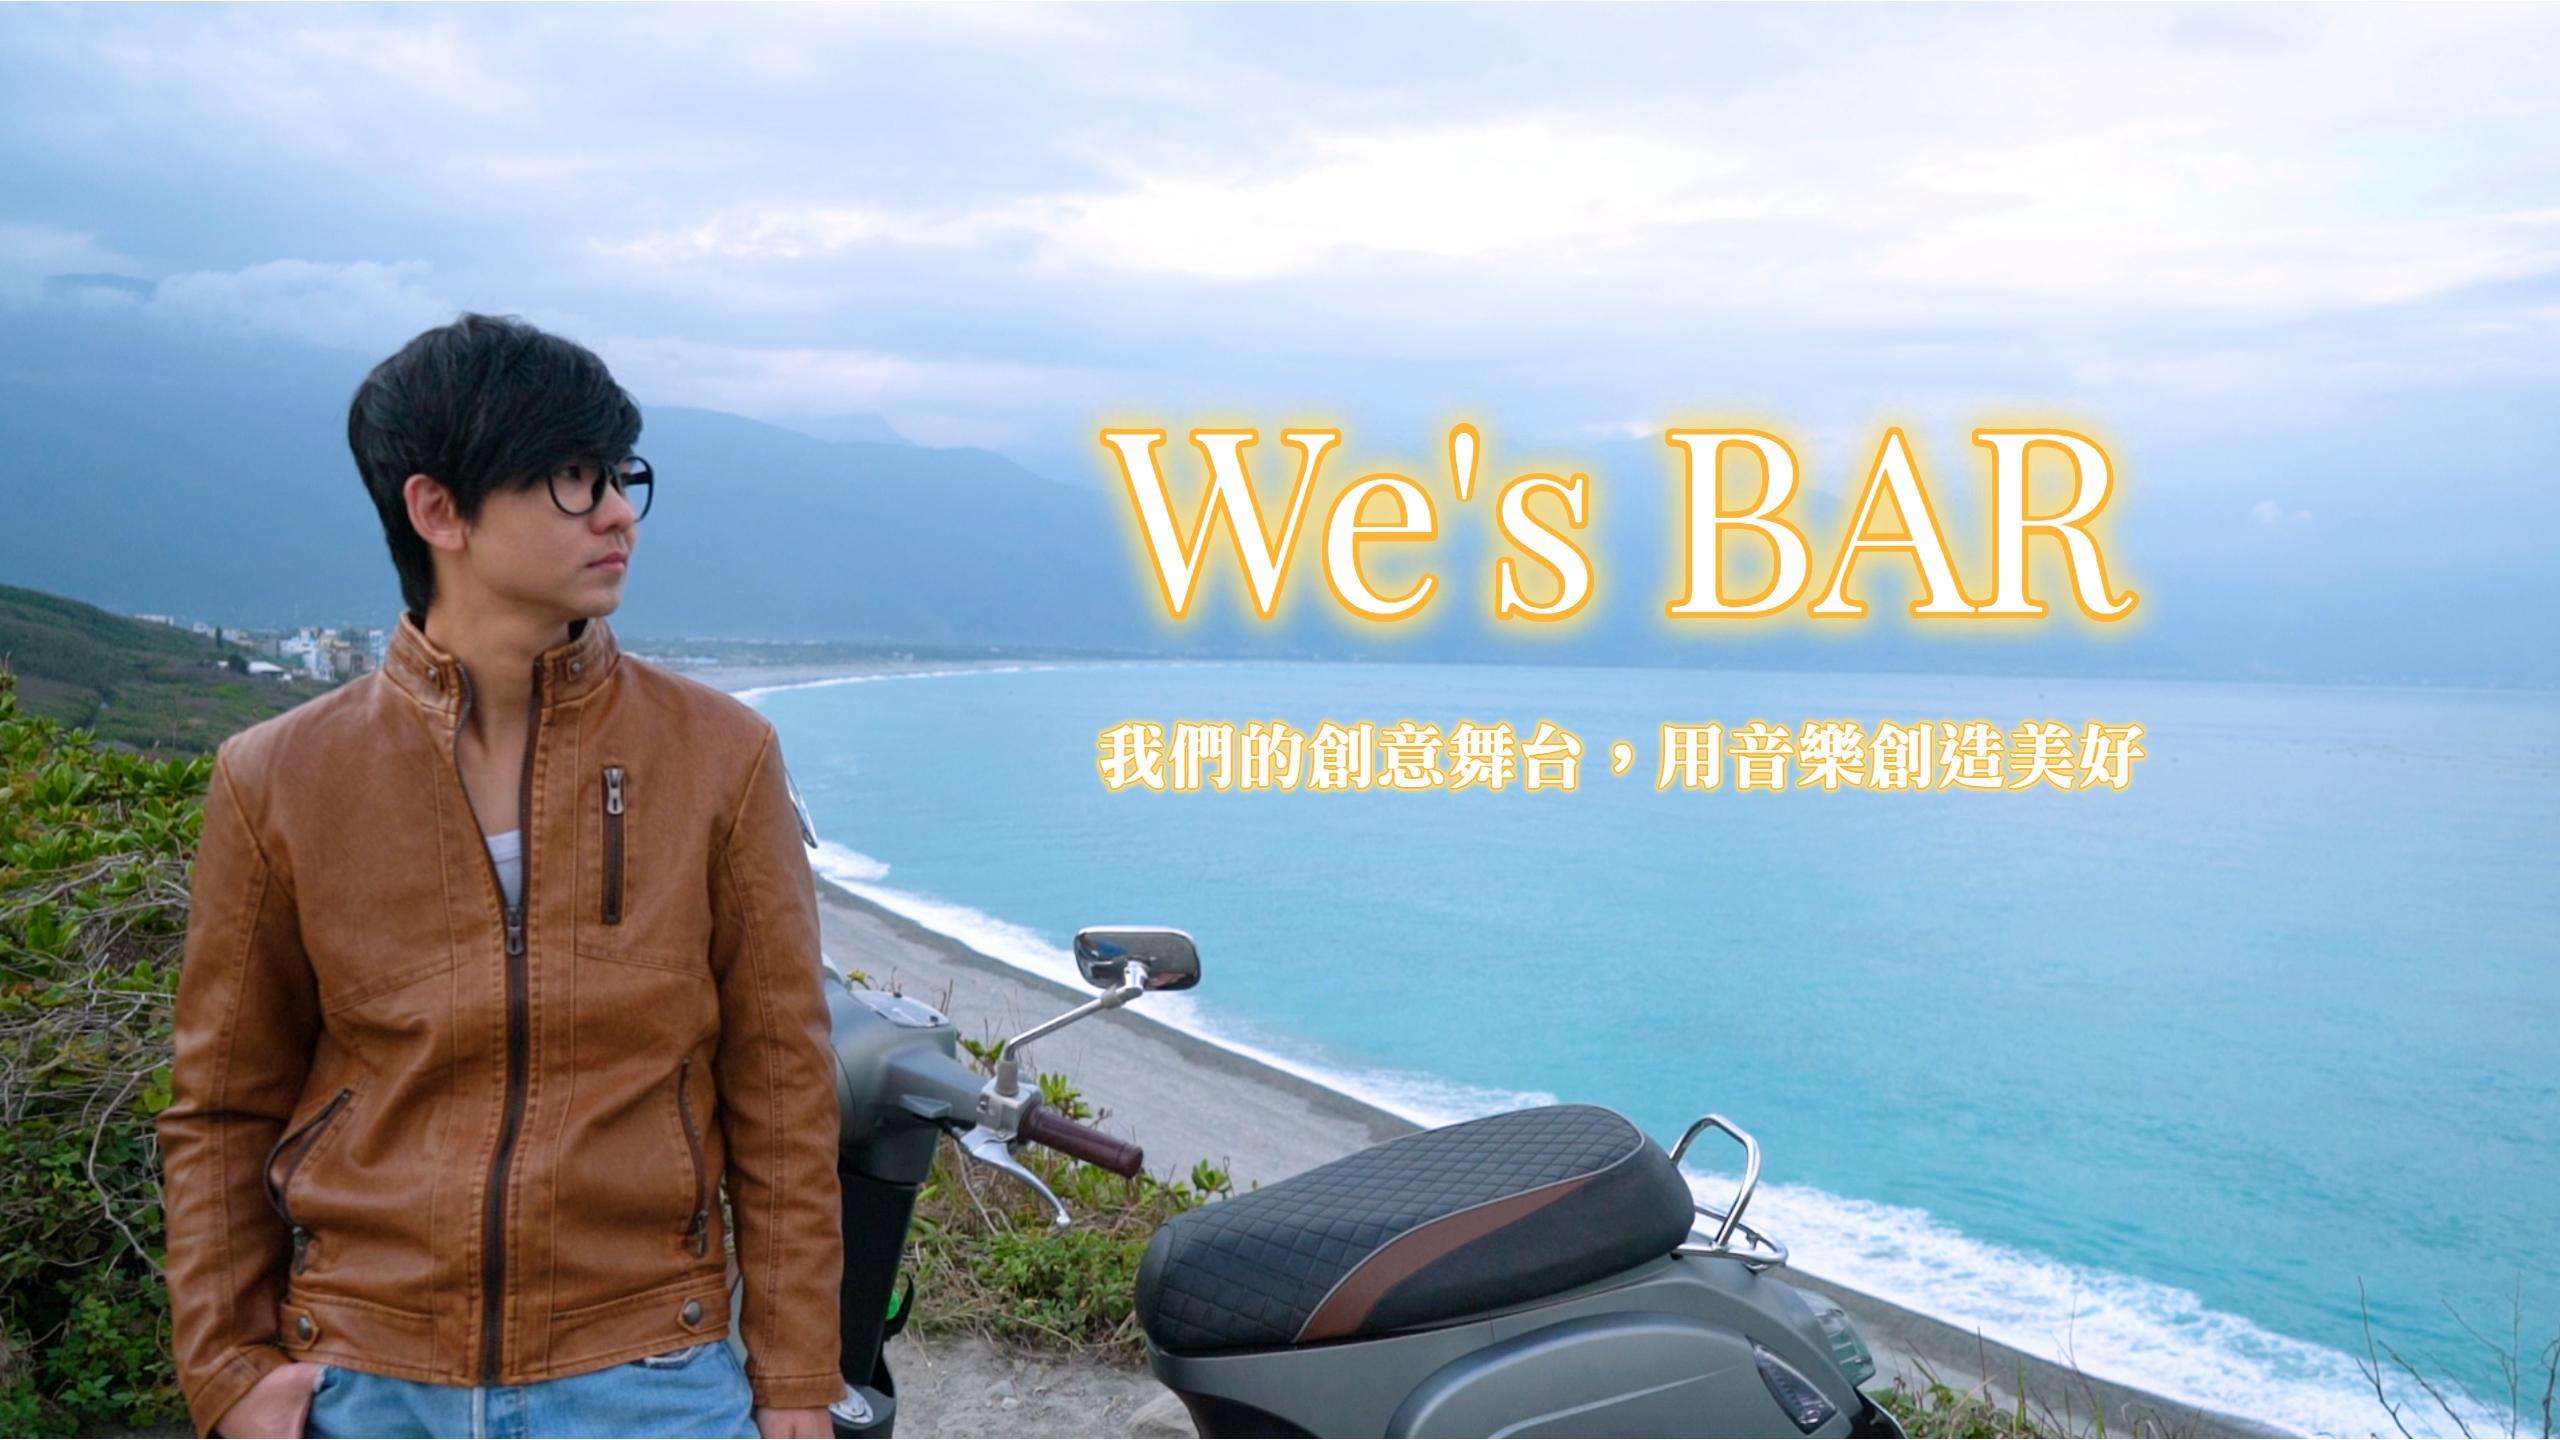 【We's BAR】-屬於你我的創意舞台,讓音樂離不開我們!